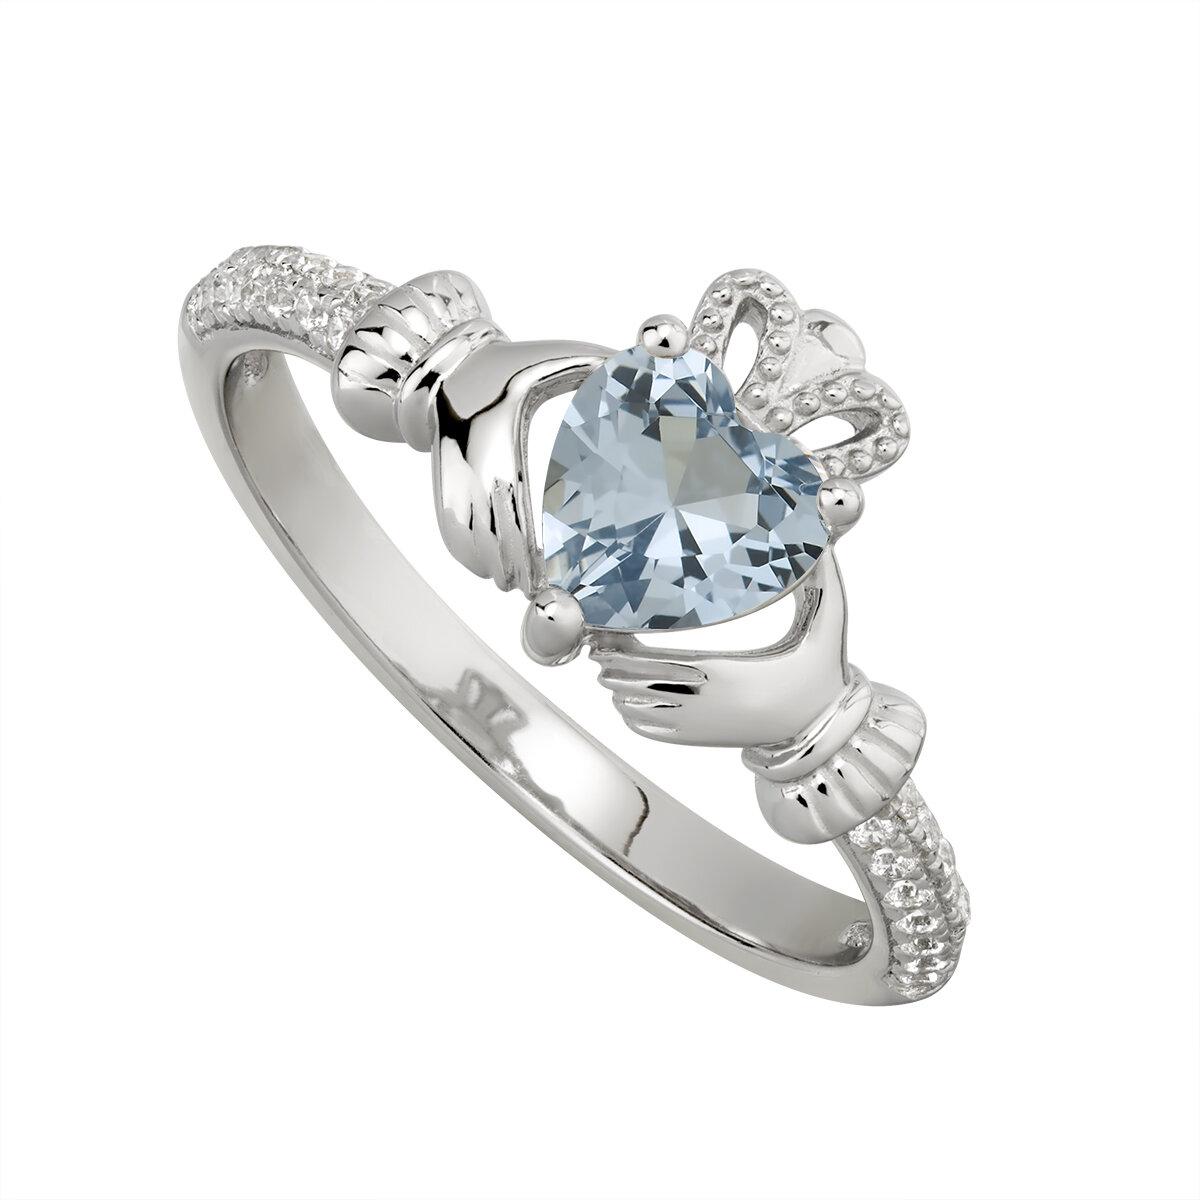 sterling silver claddagh ring december birthstone s2106212 from Solvar